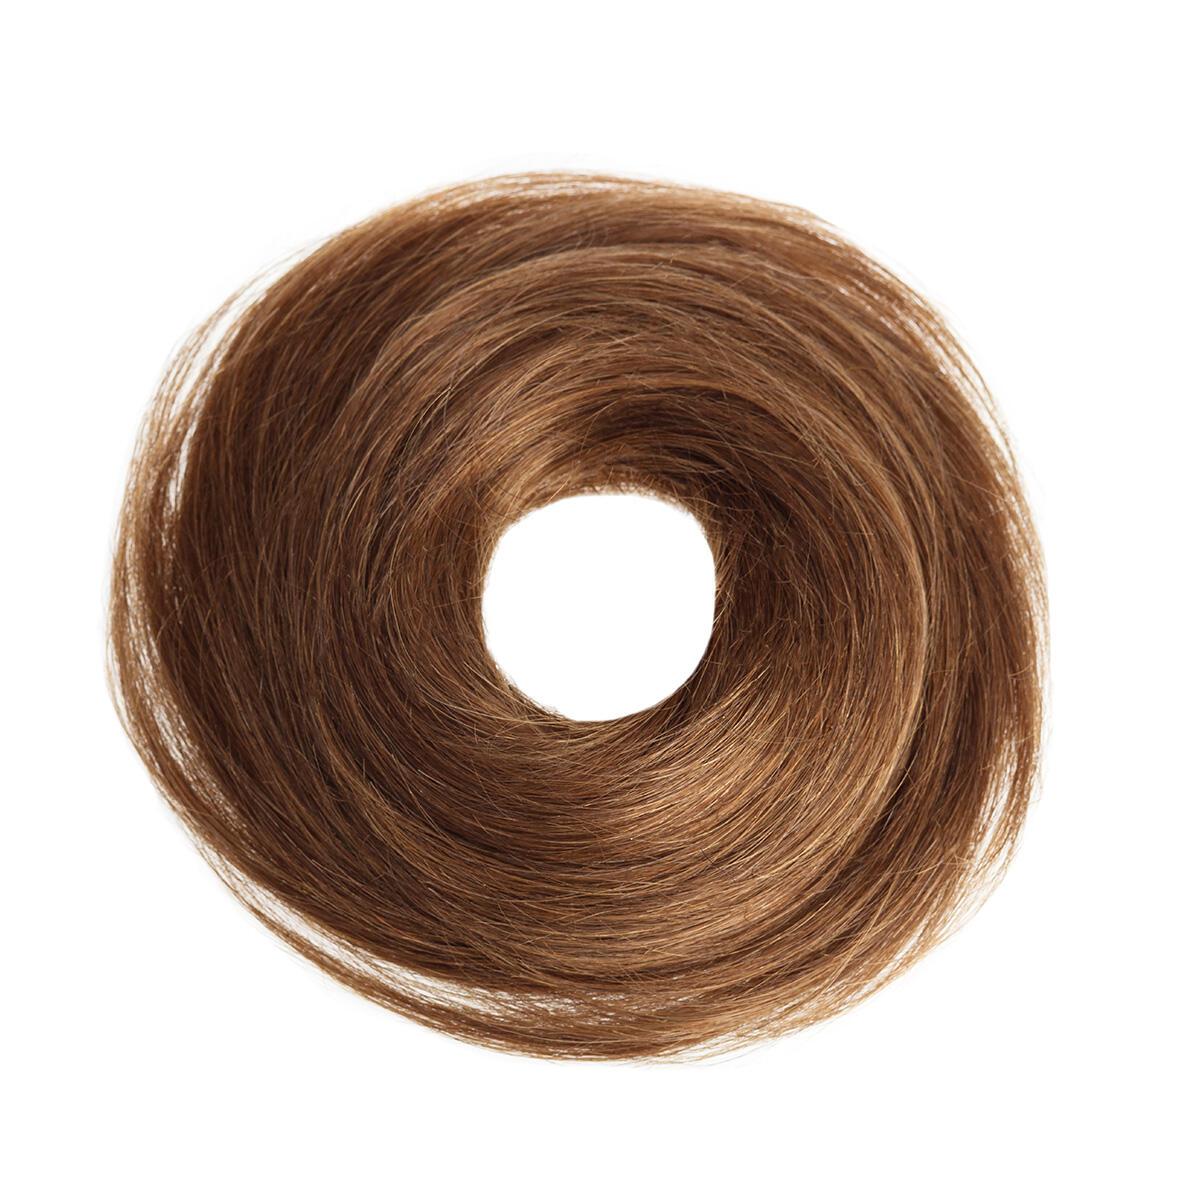 Volume Hair Scrunchie Original 40 g 5.0 Brown 0 cm